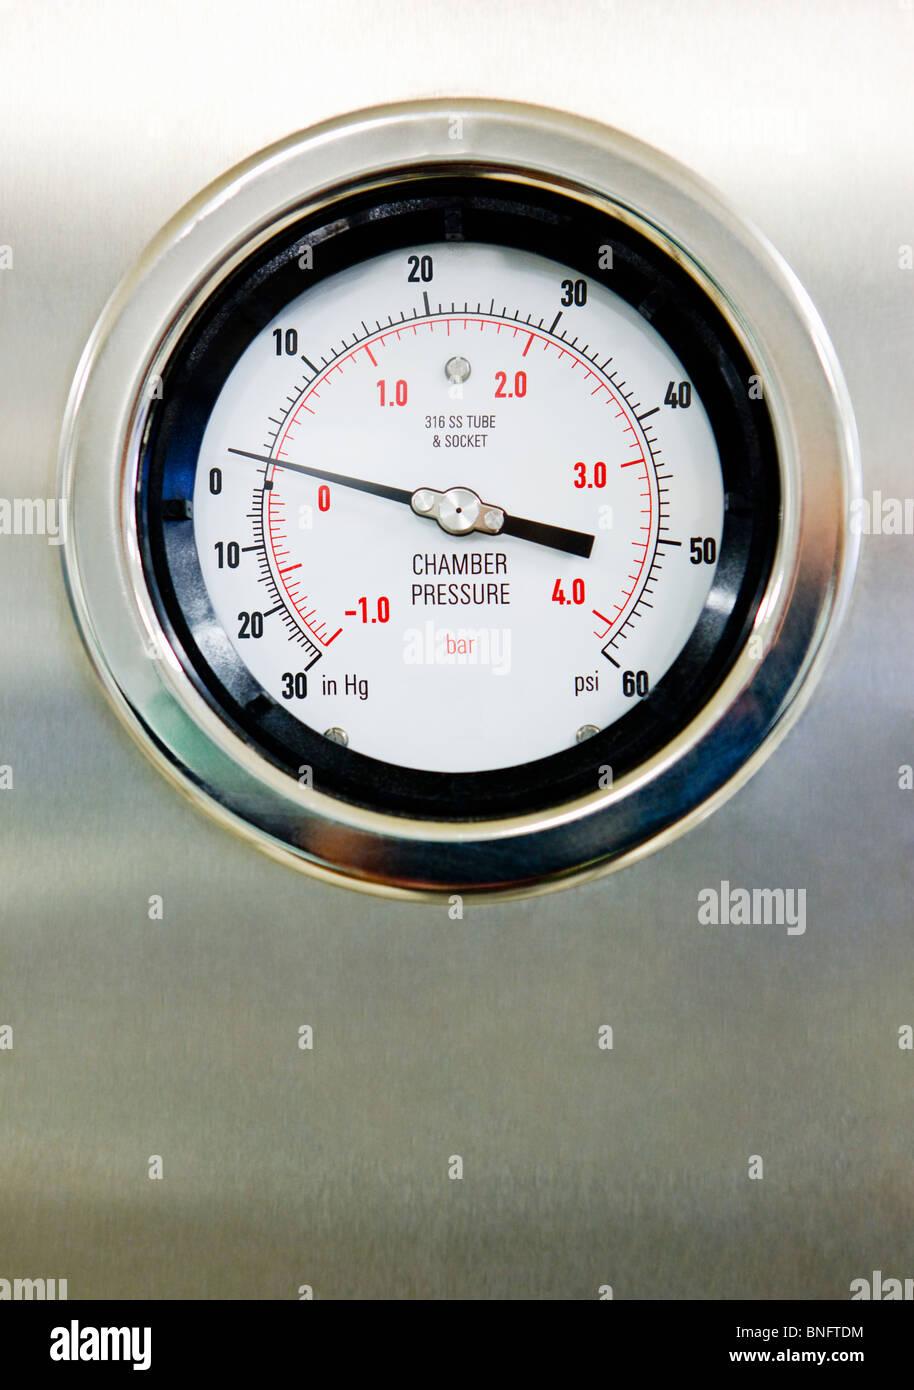 Hospital Pressure Gauge - Stock Image